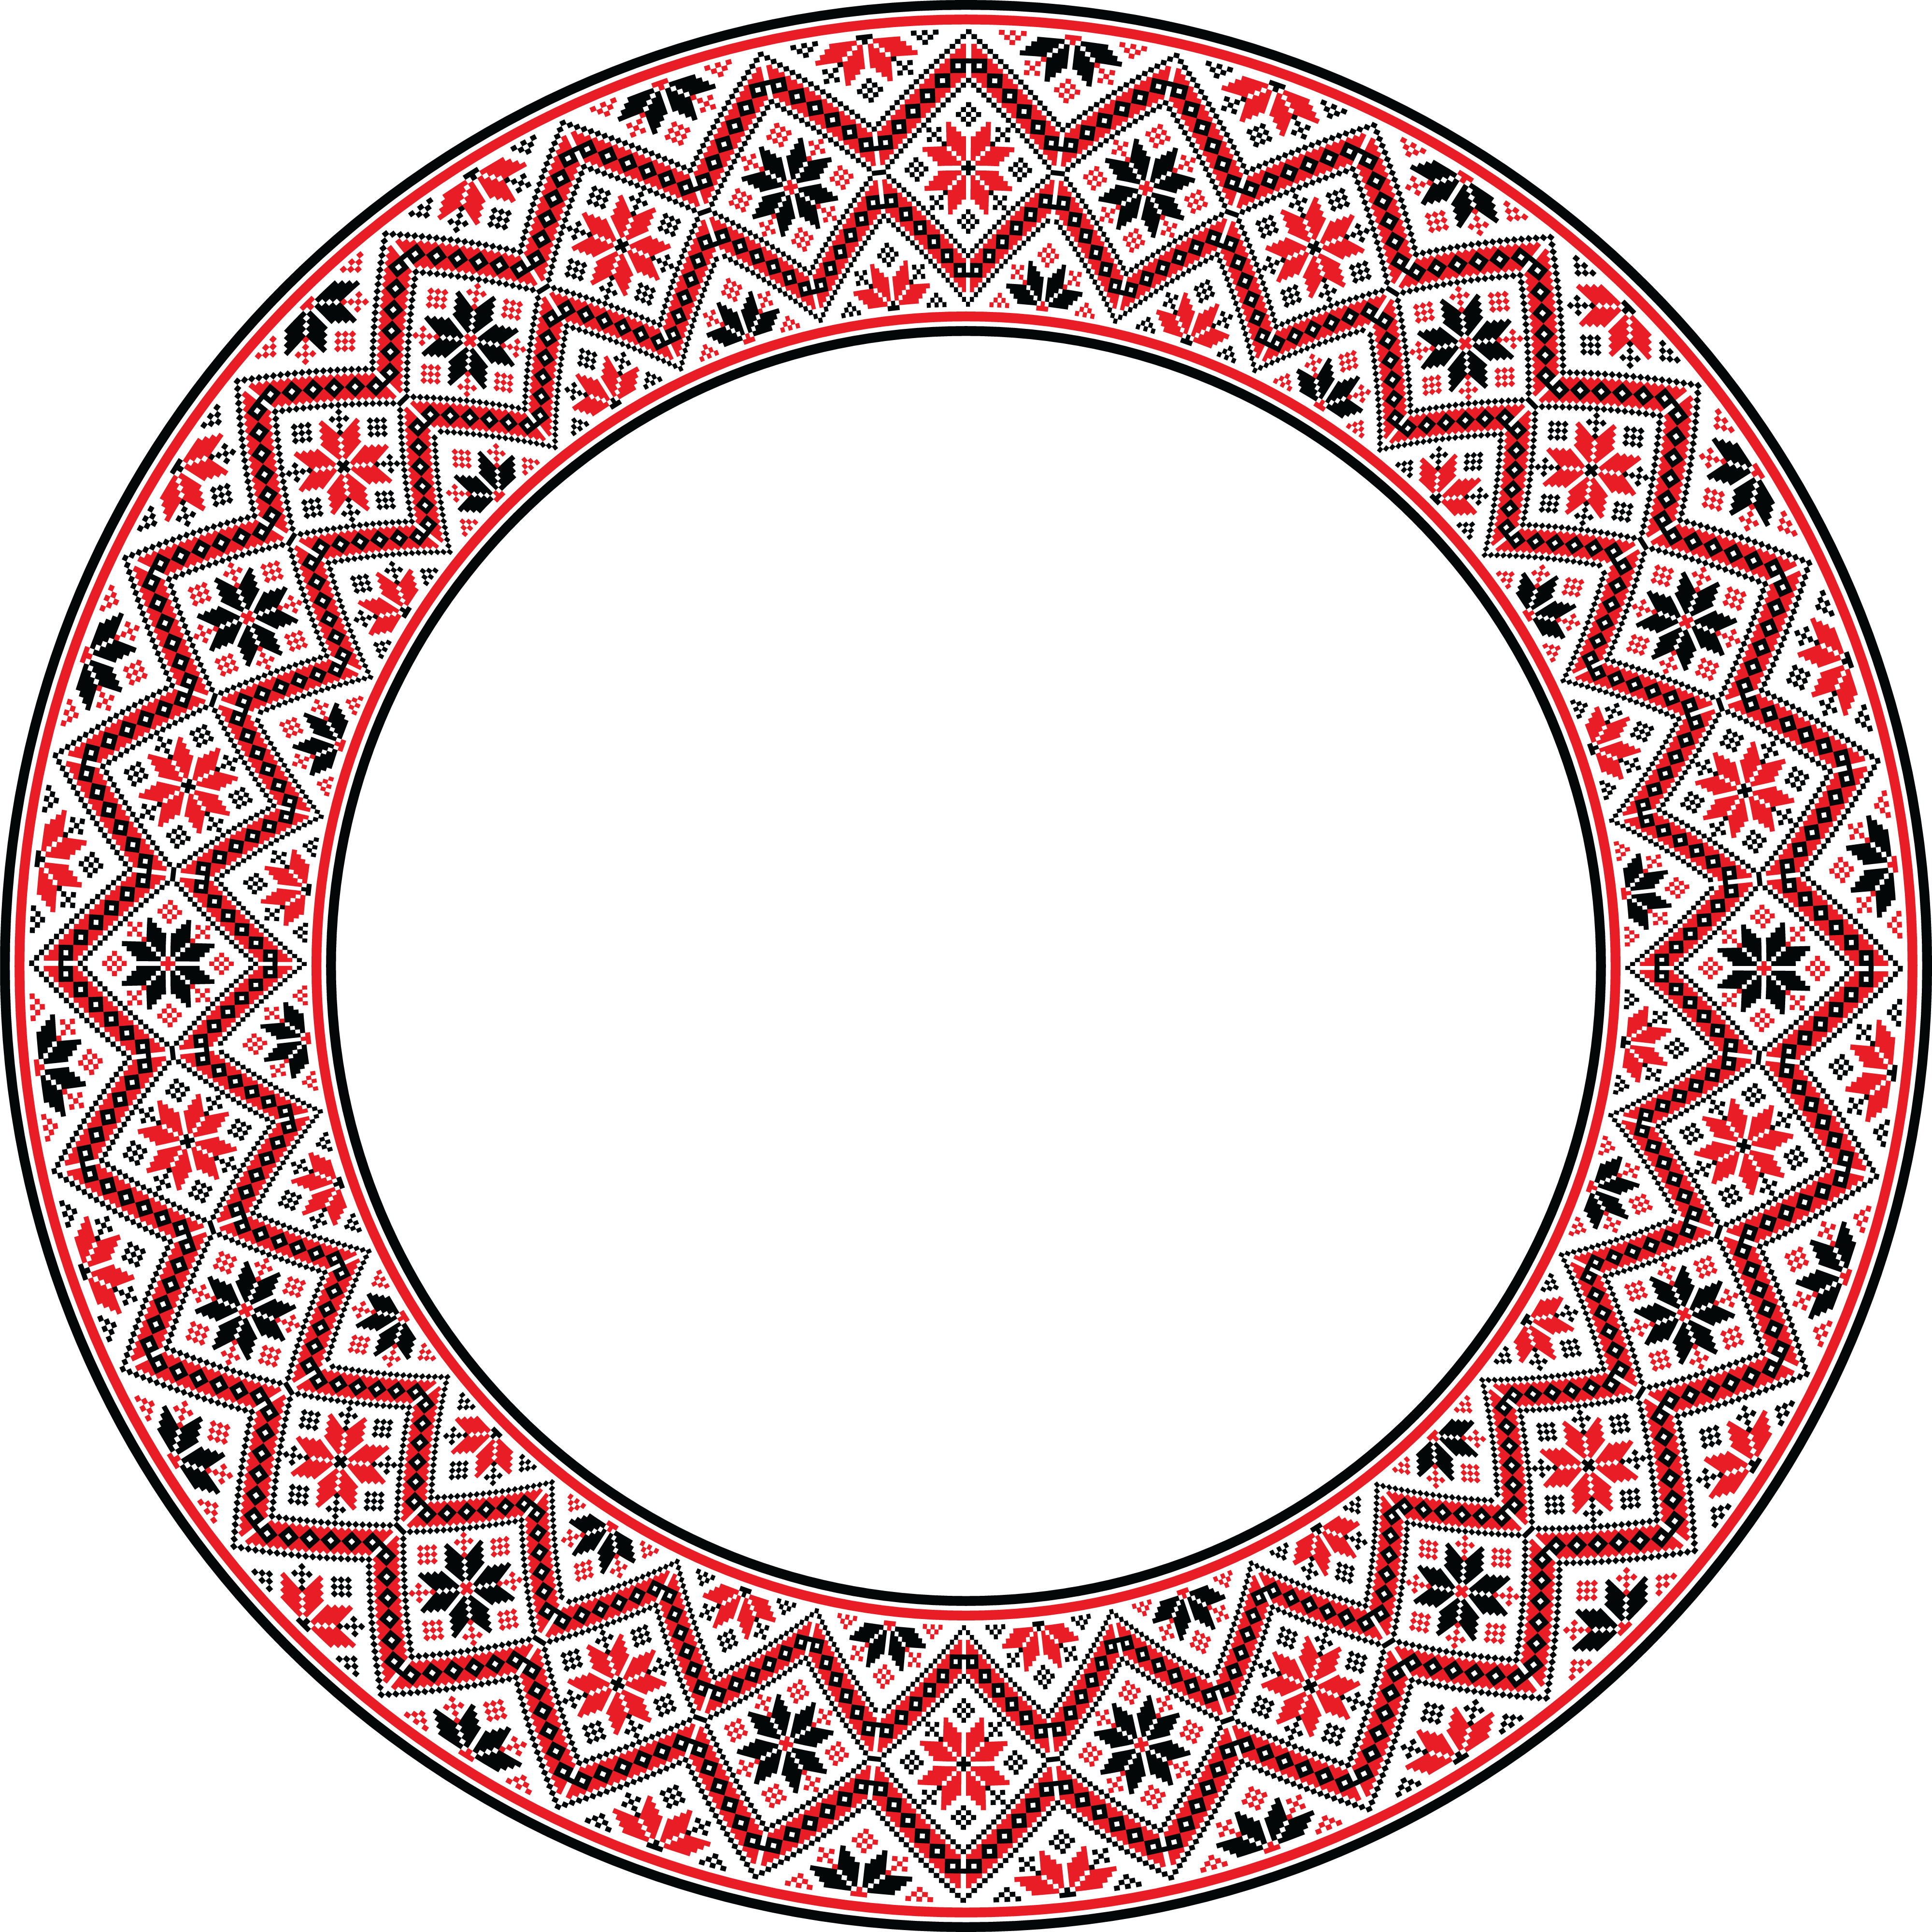 Round Frame PNG Transparent Image